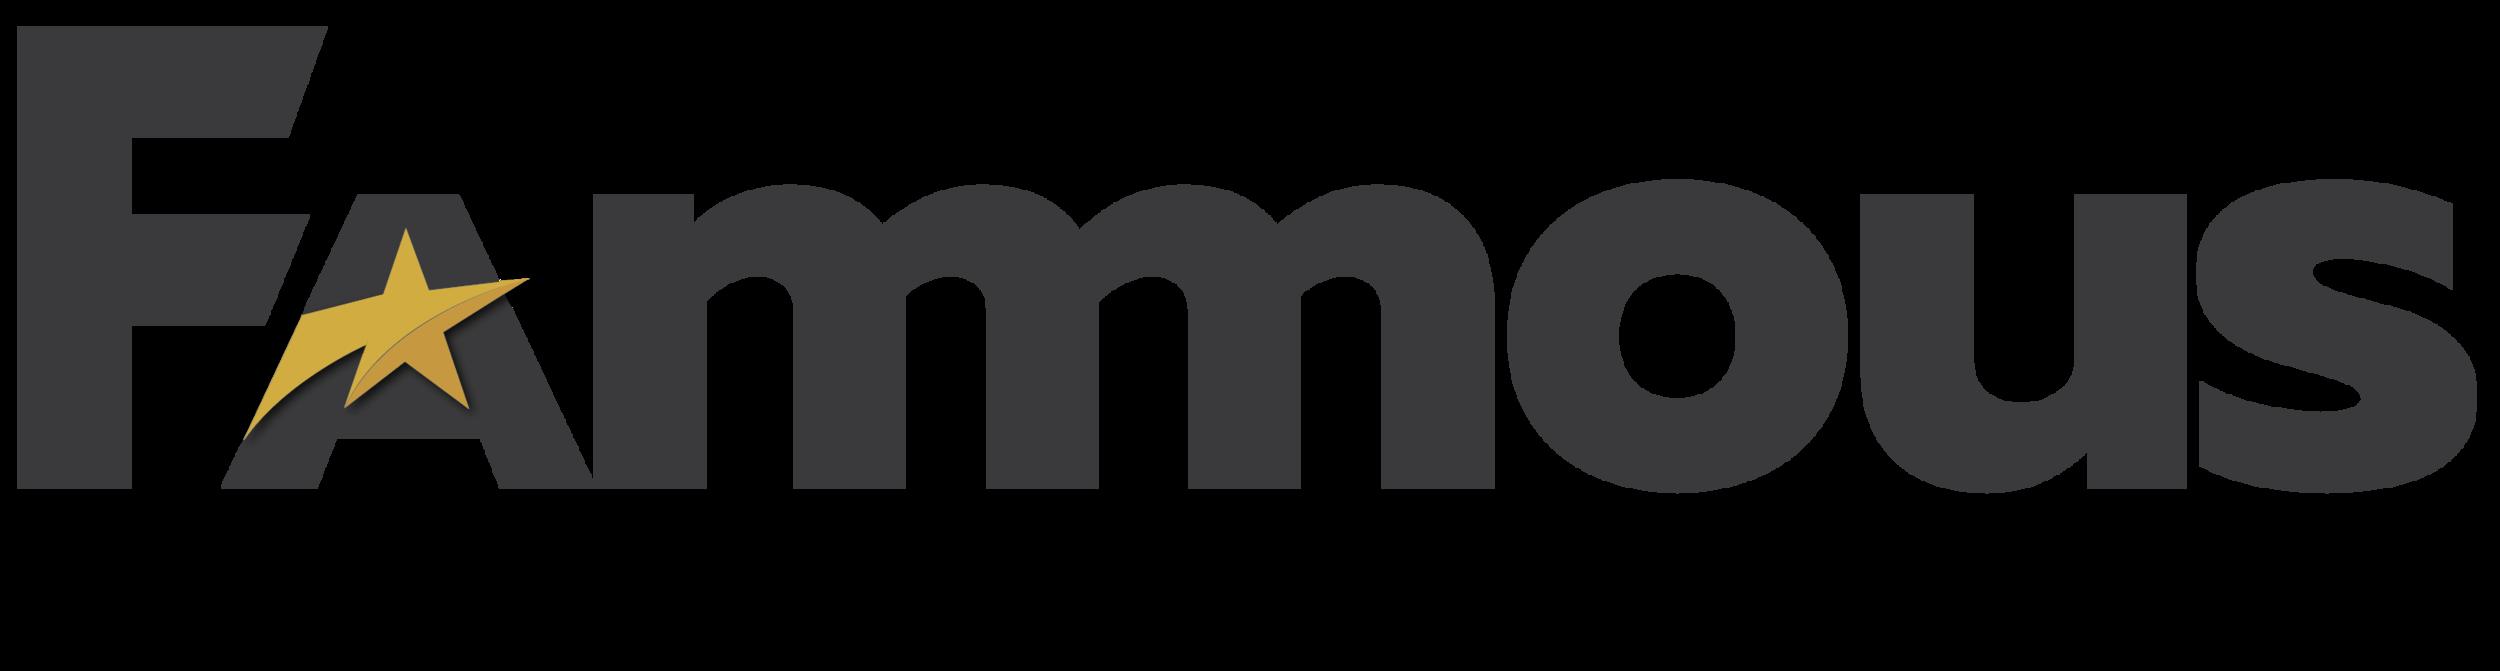 Logo Fammous-02.png